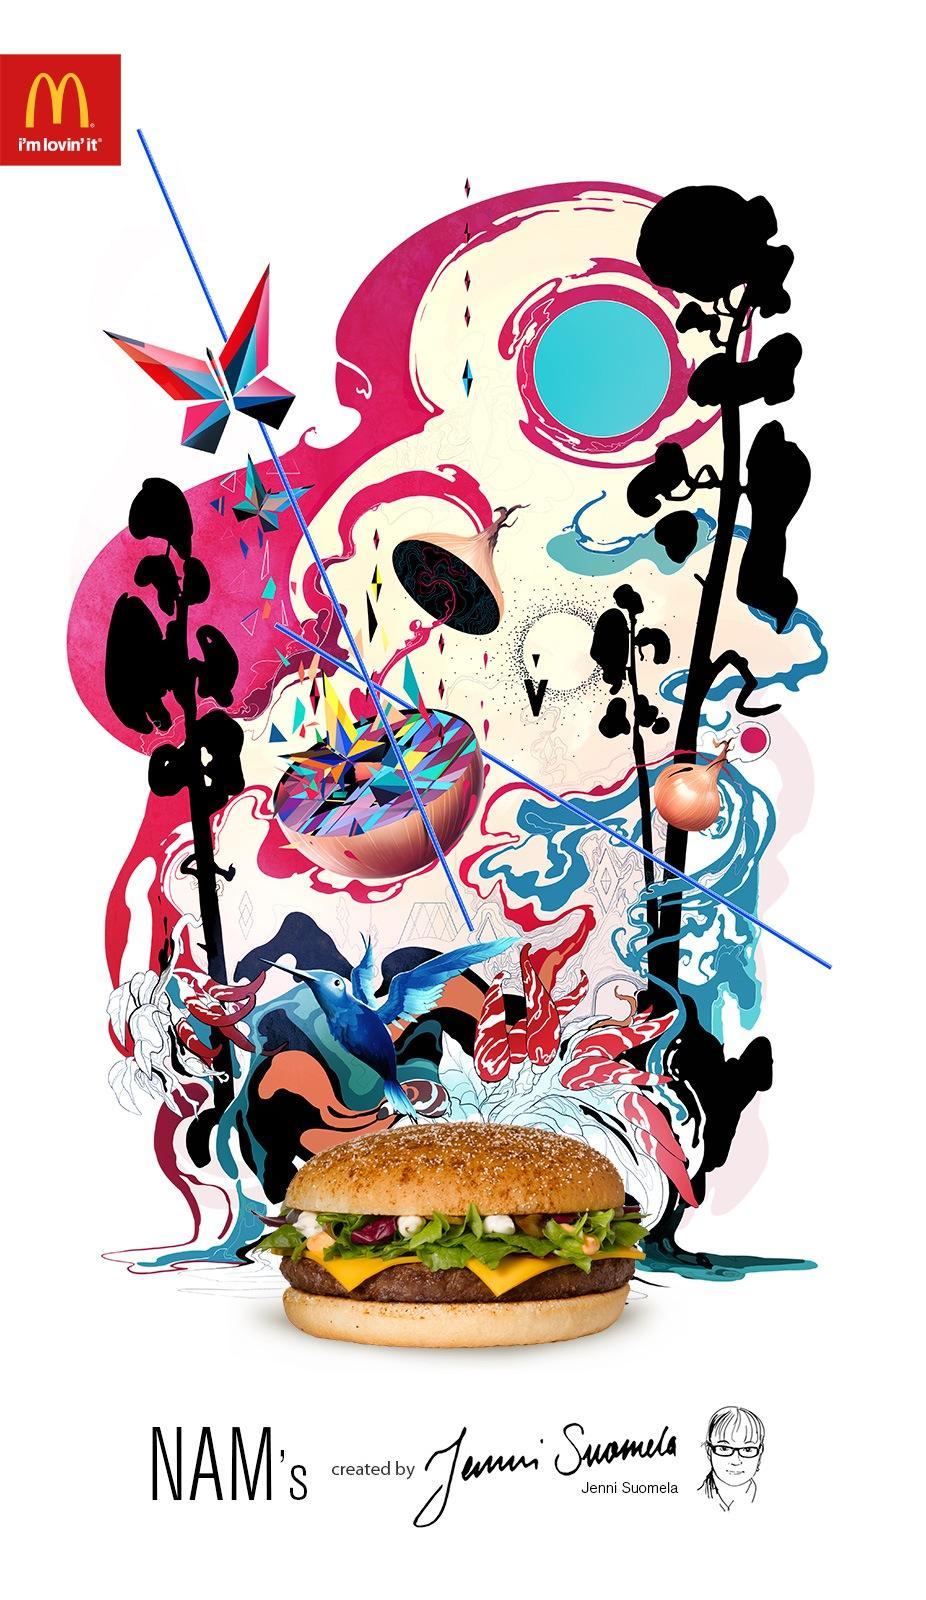 McDonald's Print Ad -  Nam's print